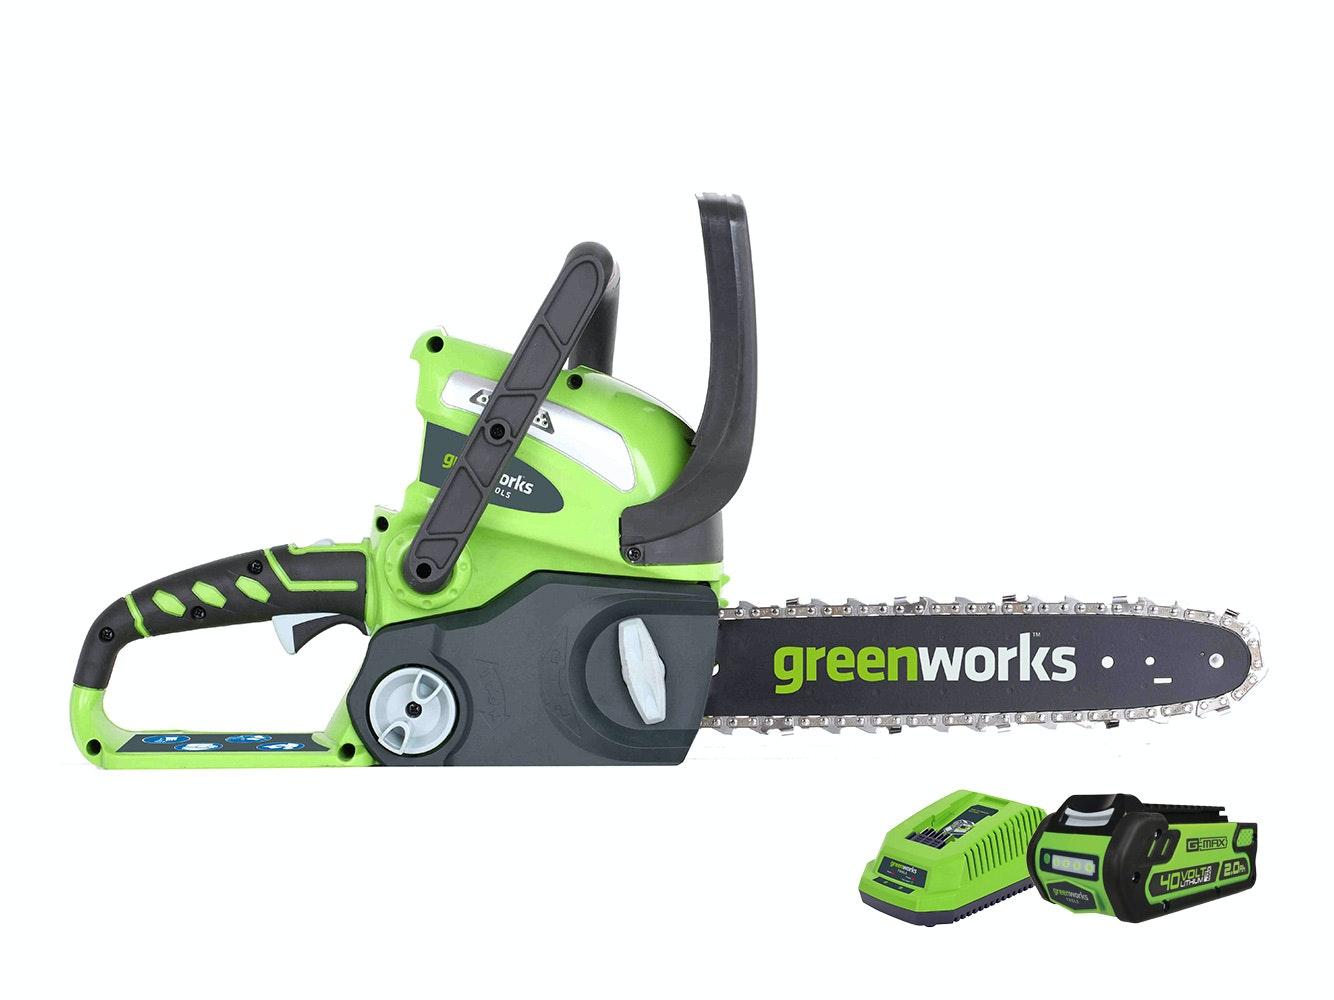 GreenWorks Chainsaw G-MAX 40V Li-Ion 12